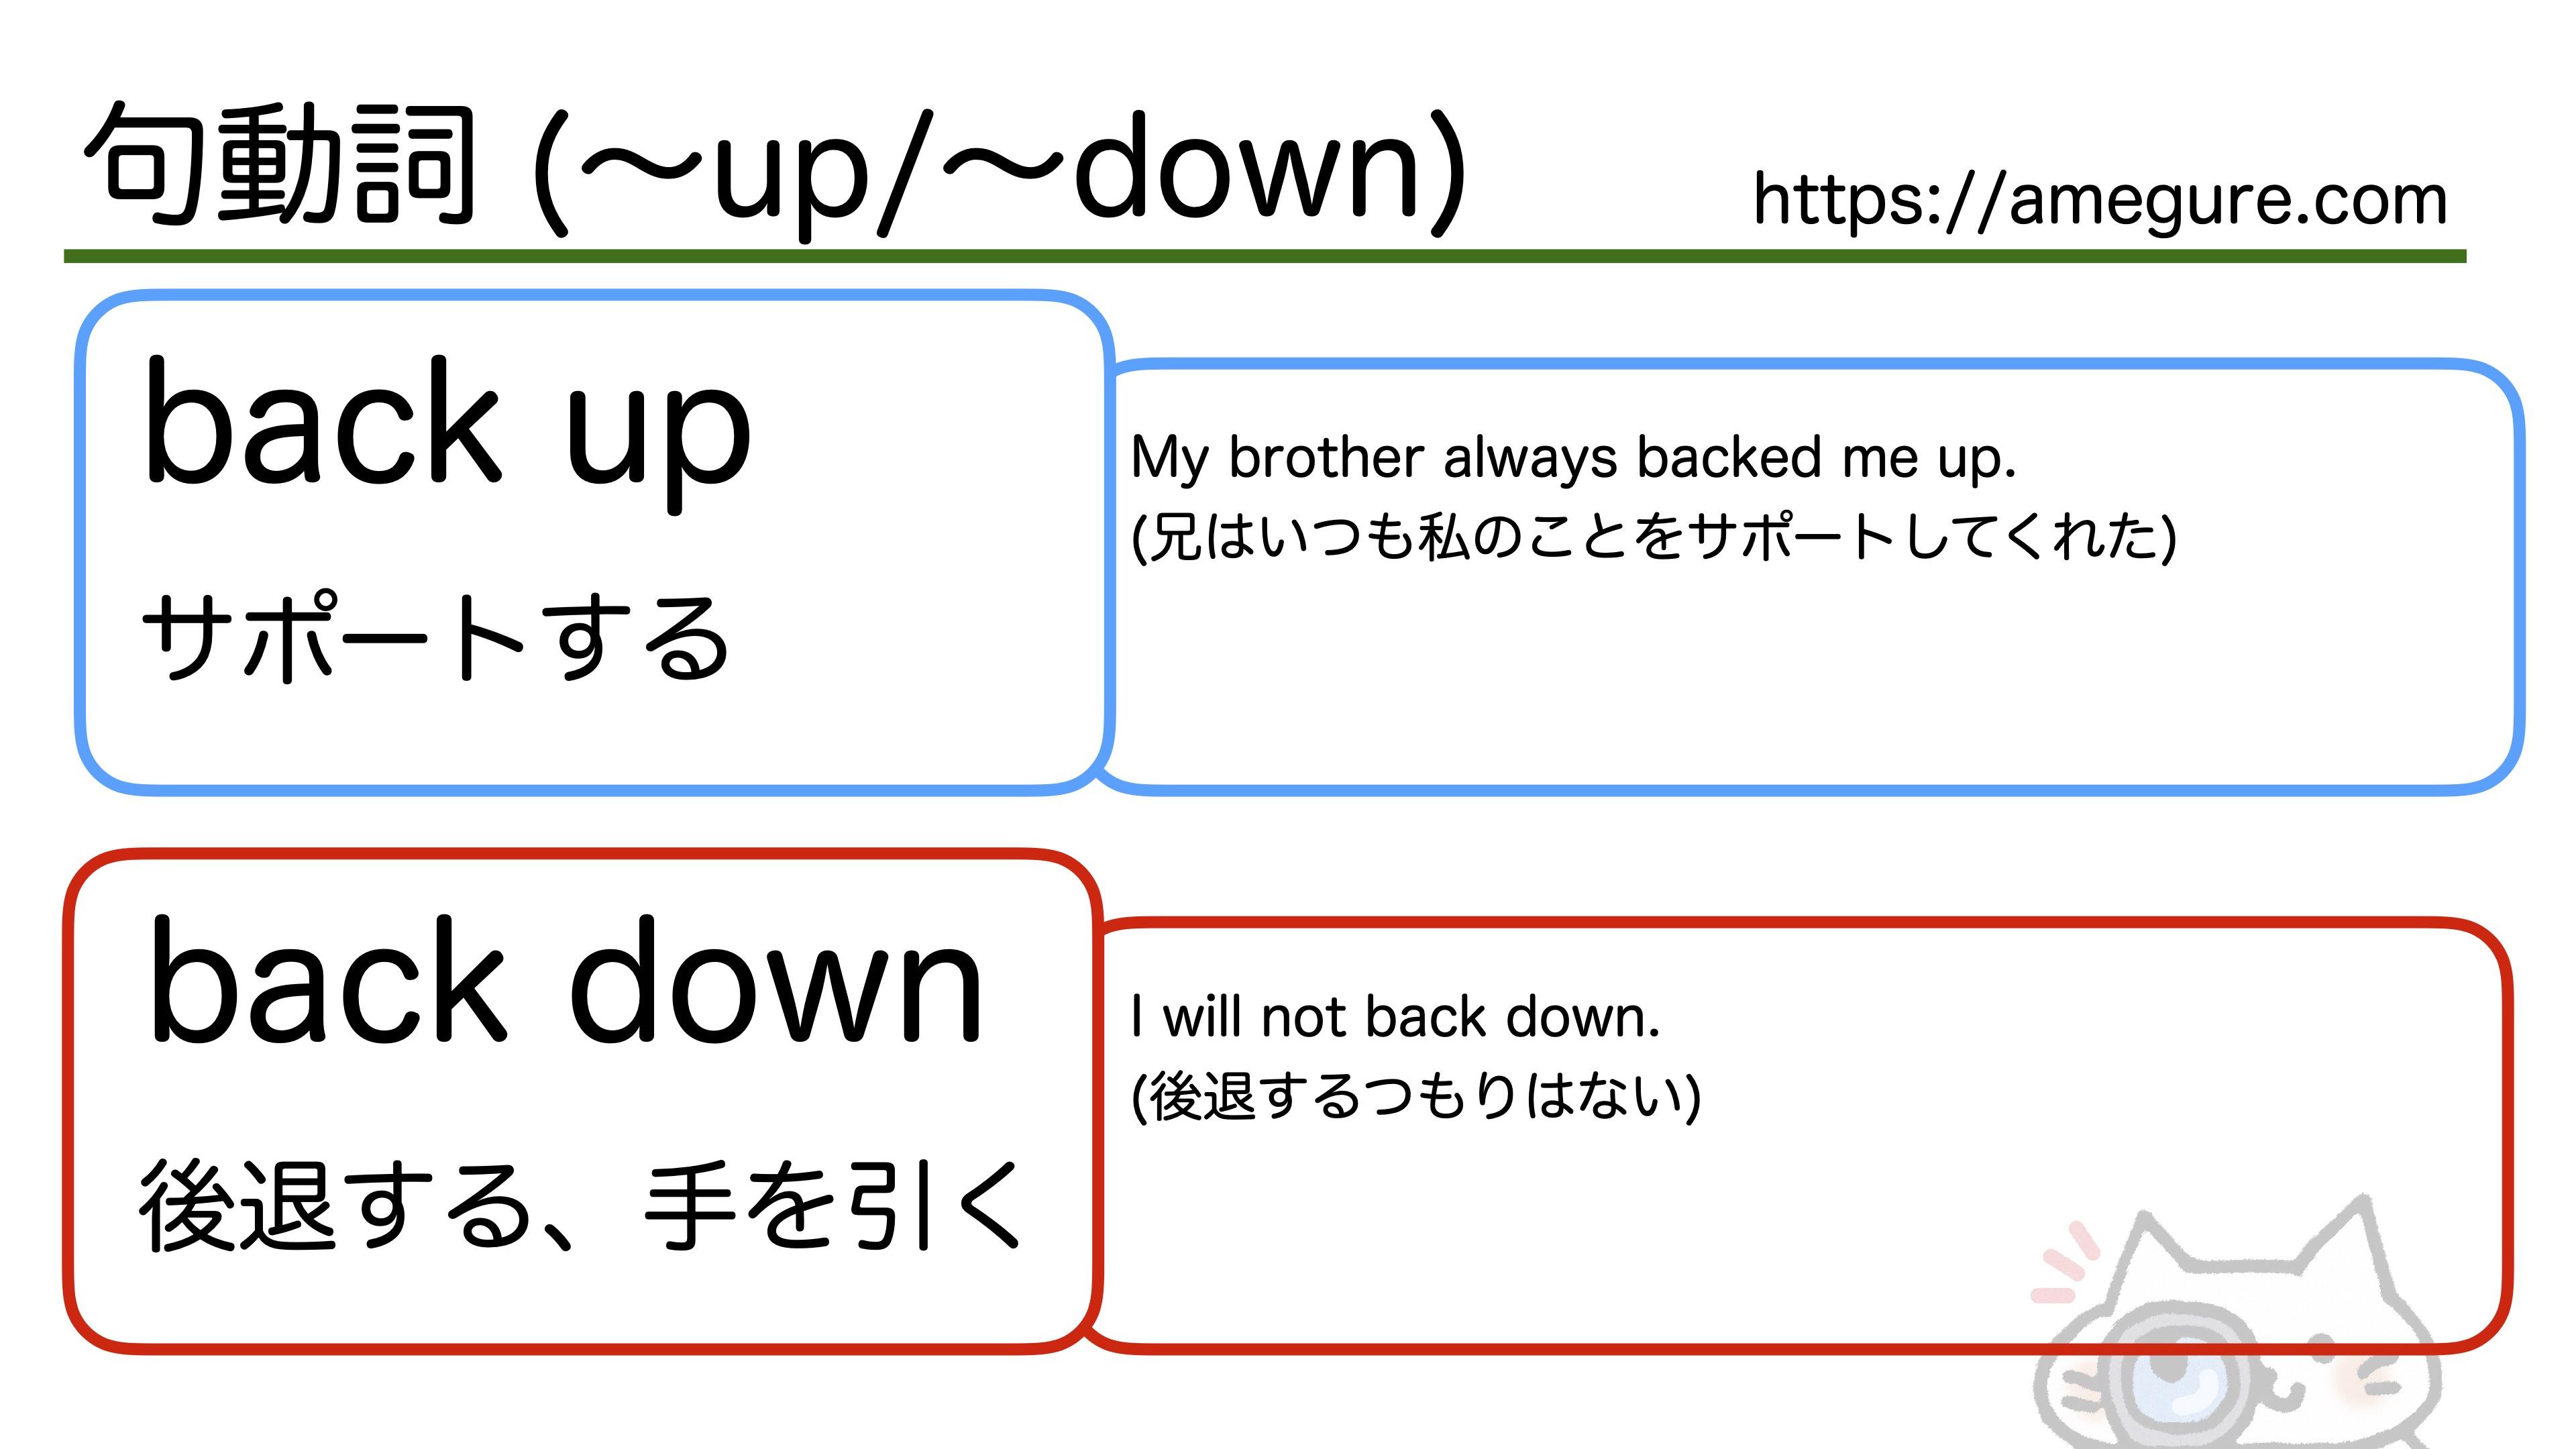 backup-backdown